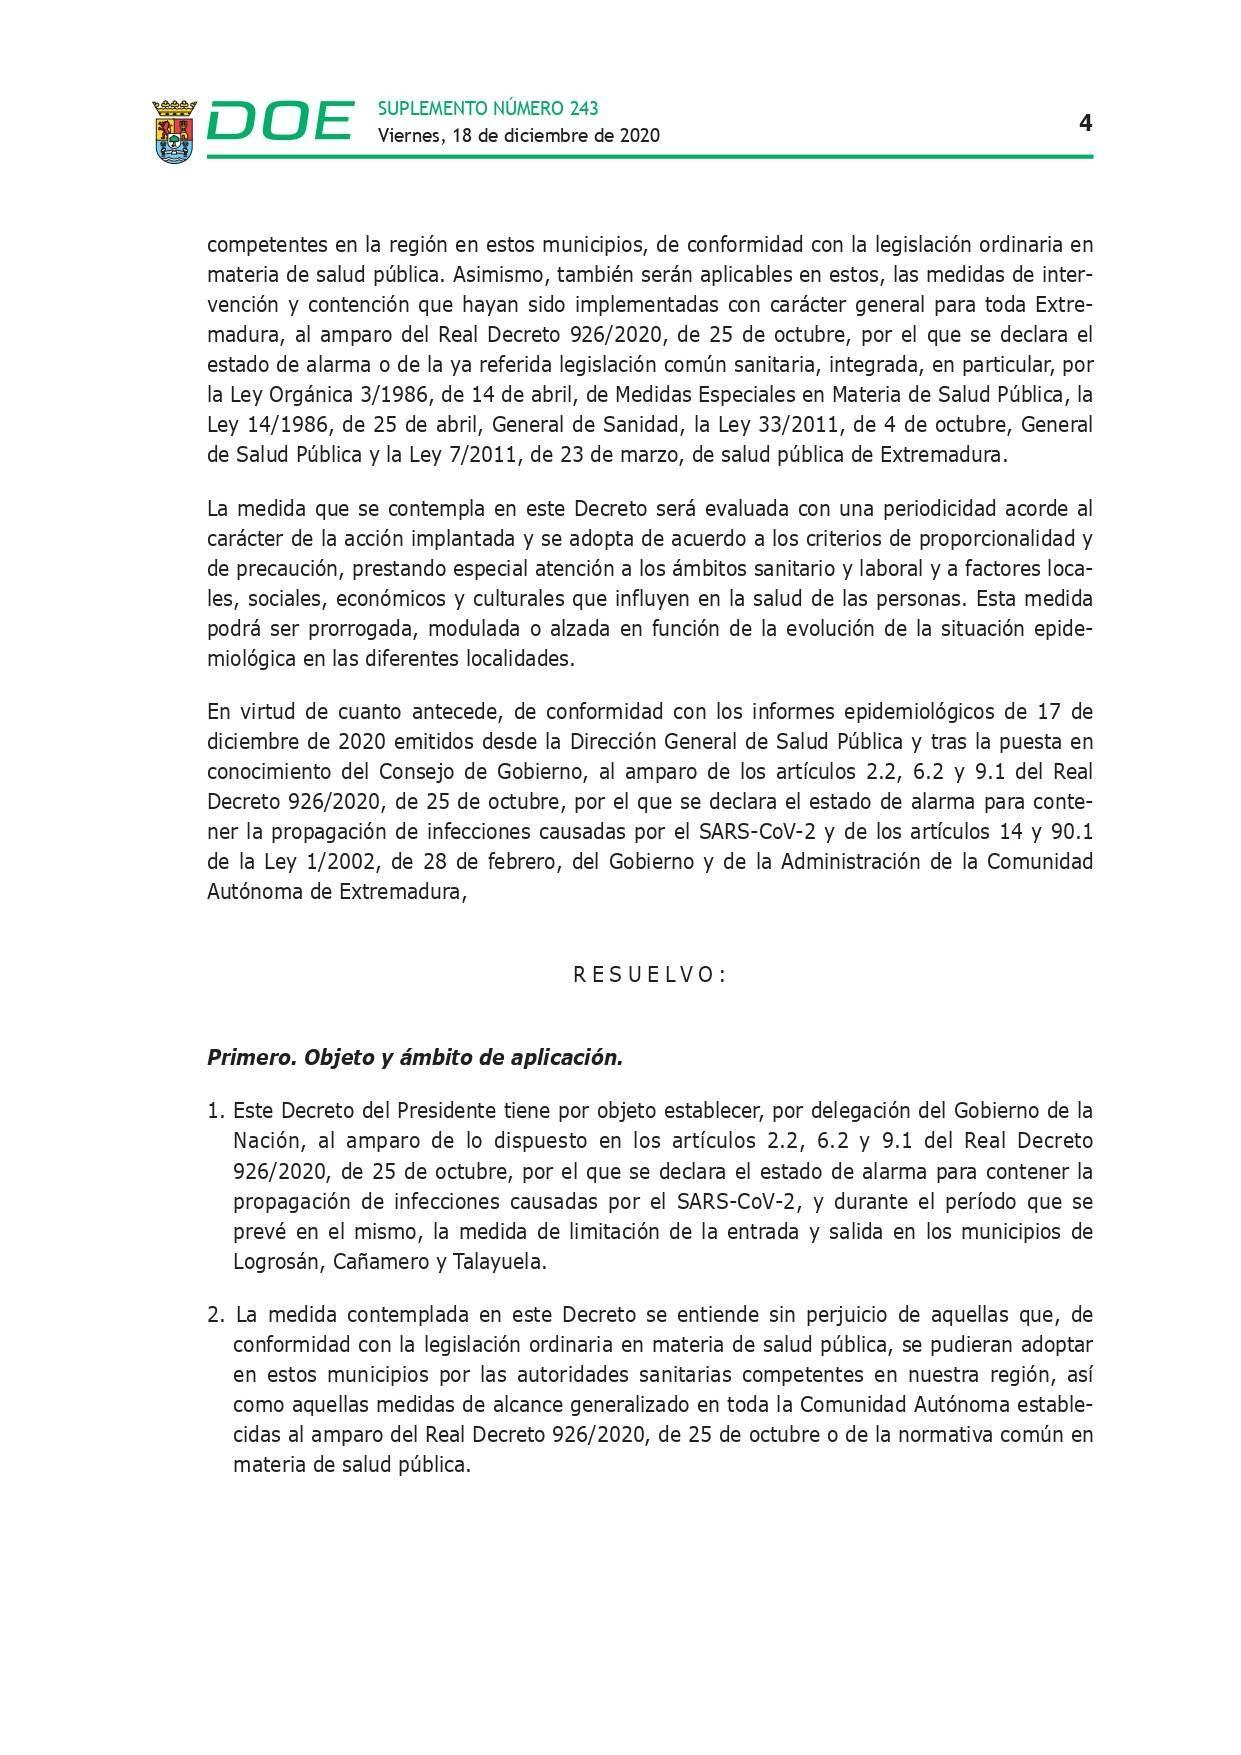 Cierre perimetral por COVID-19 (2020) - Talayuela (Cáceres), Logrosán (Cáceres) y Cañamero (Cáceres) 4